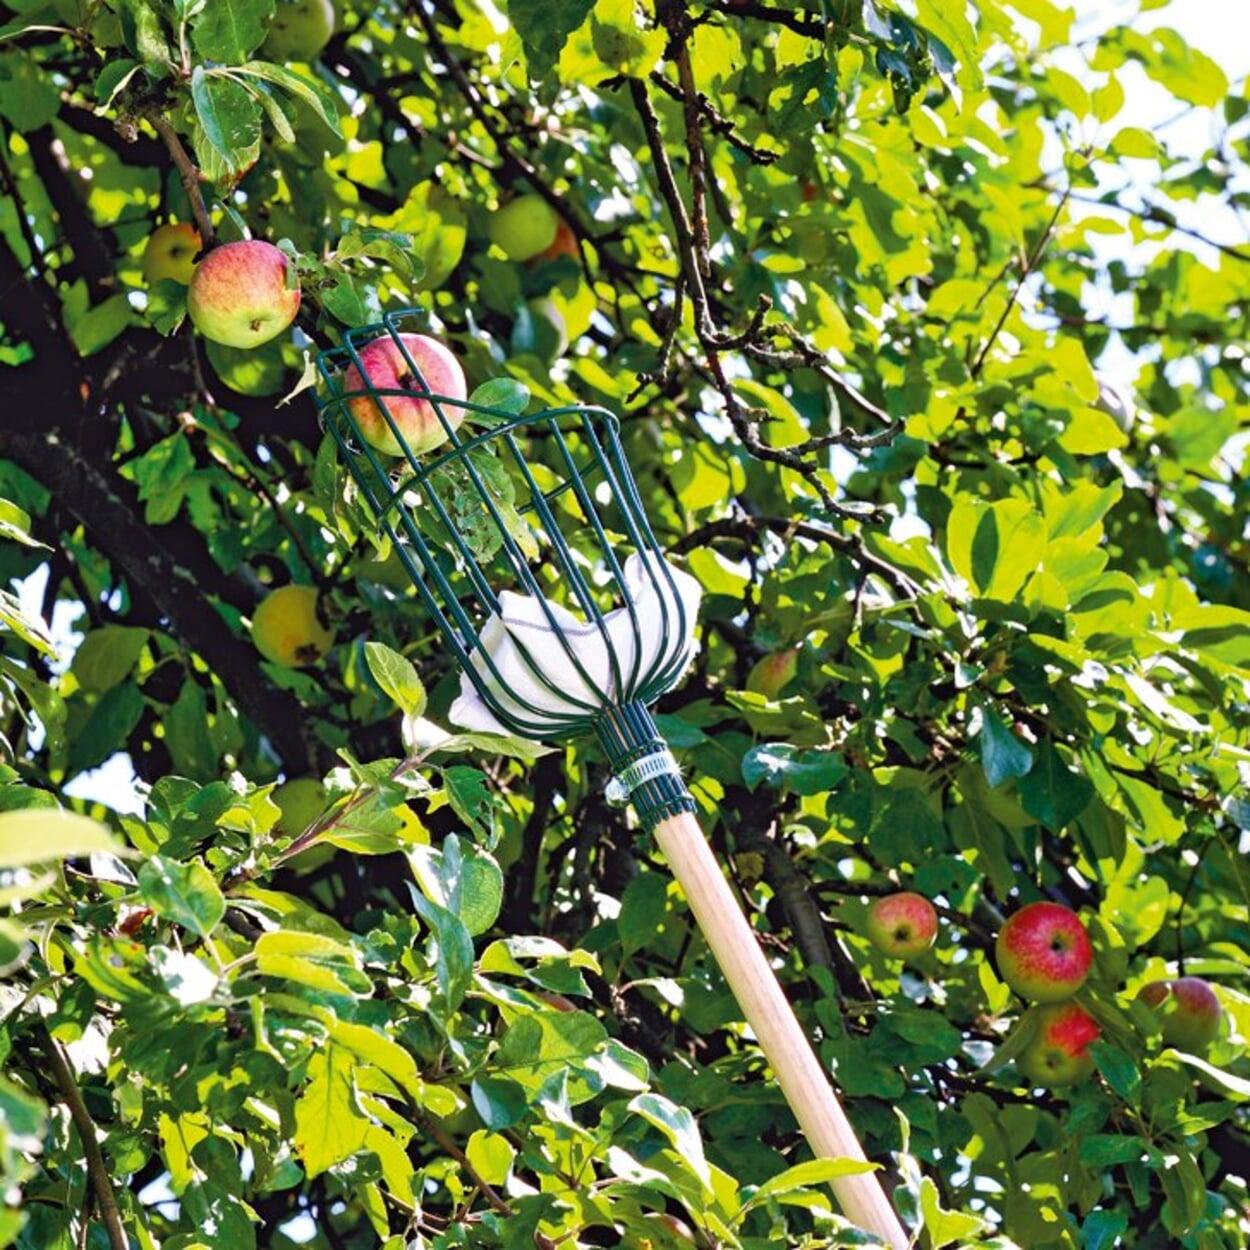 Äpfel ernten mit Pflückgerät